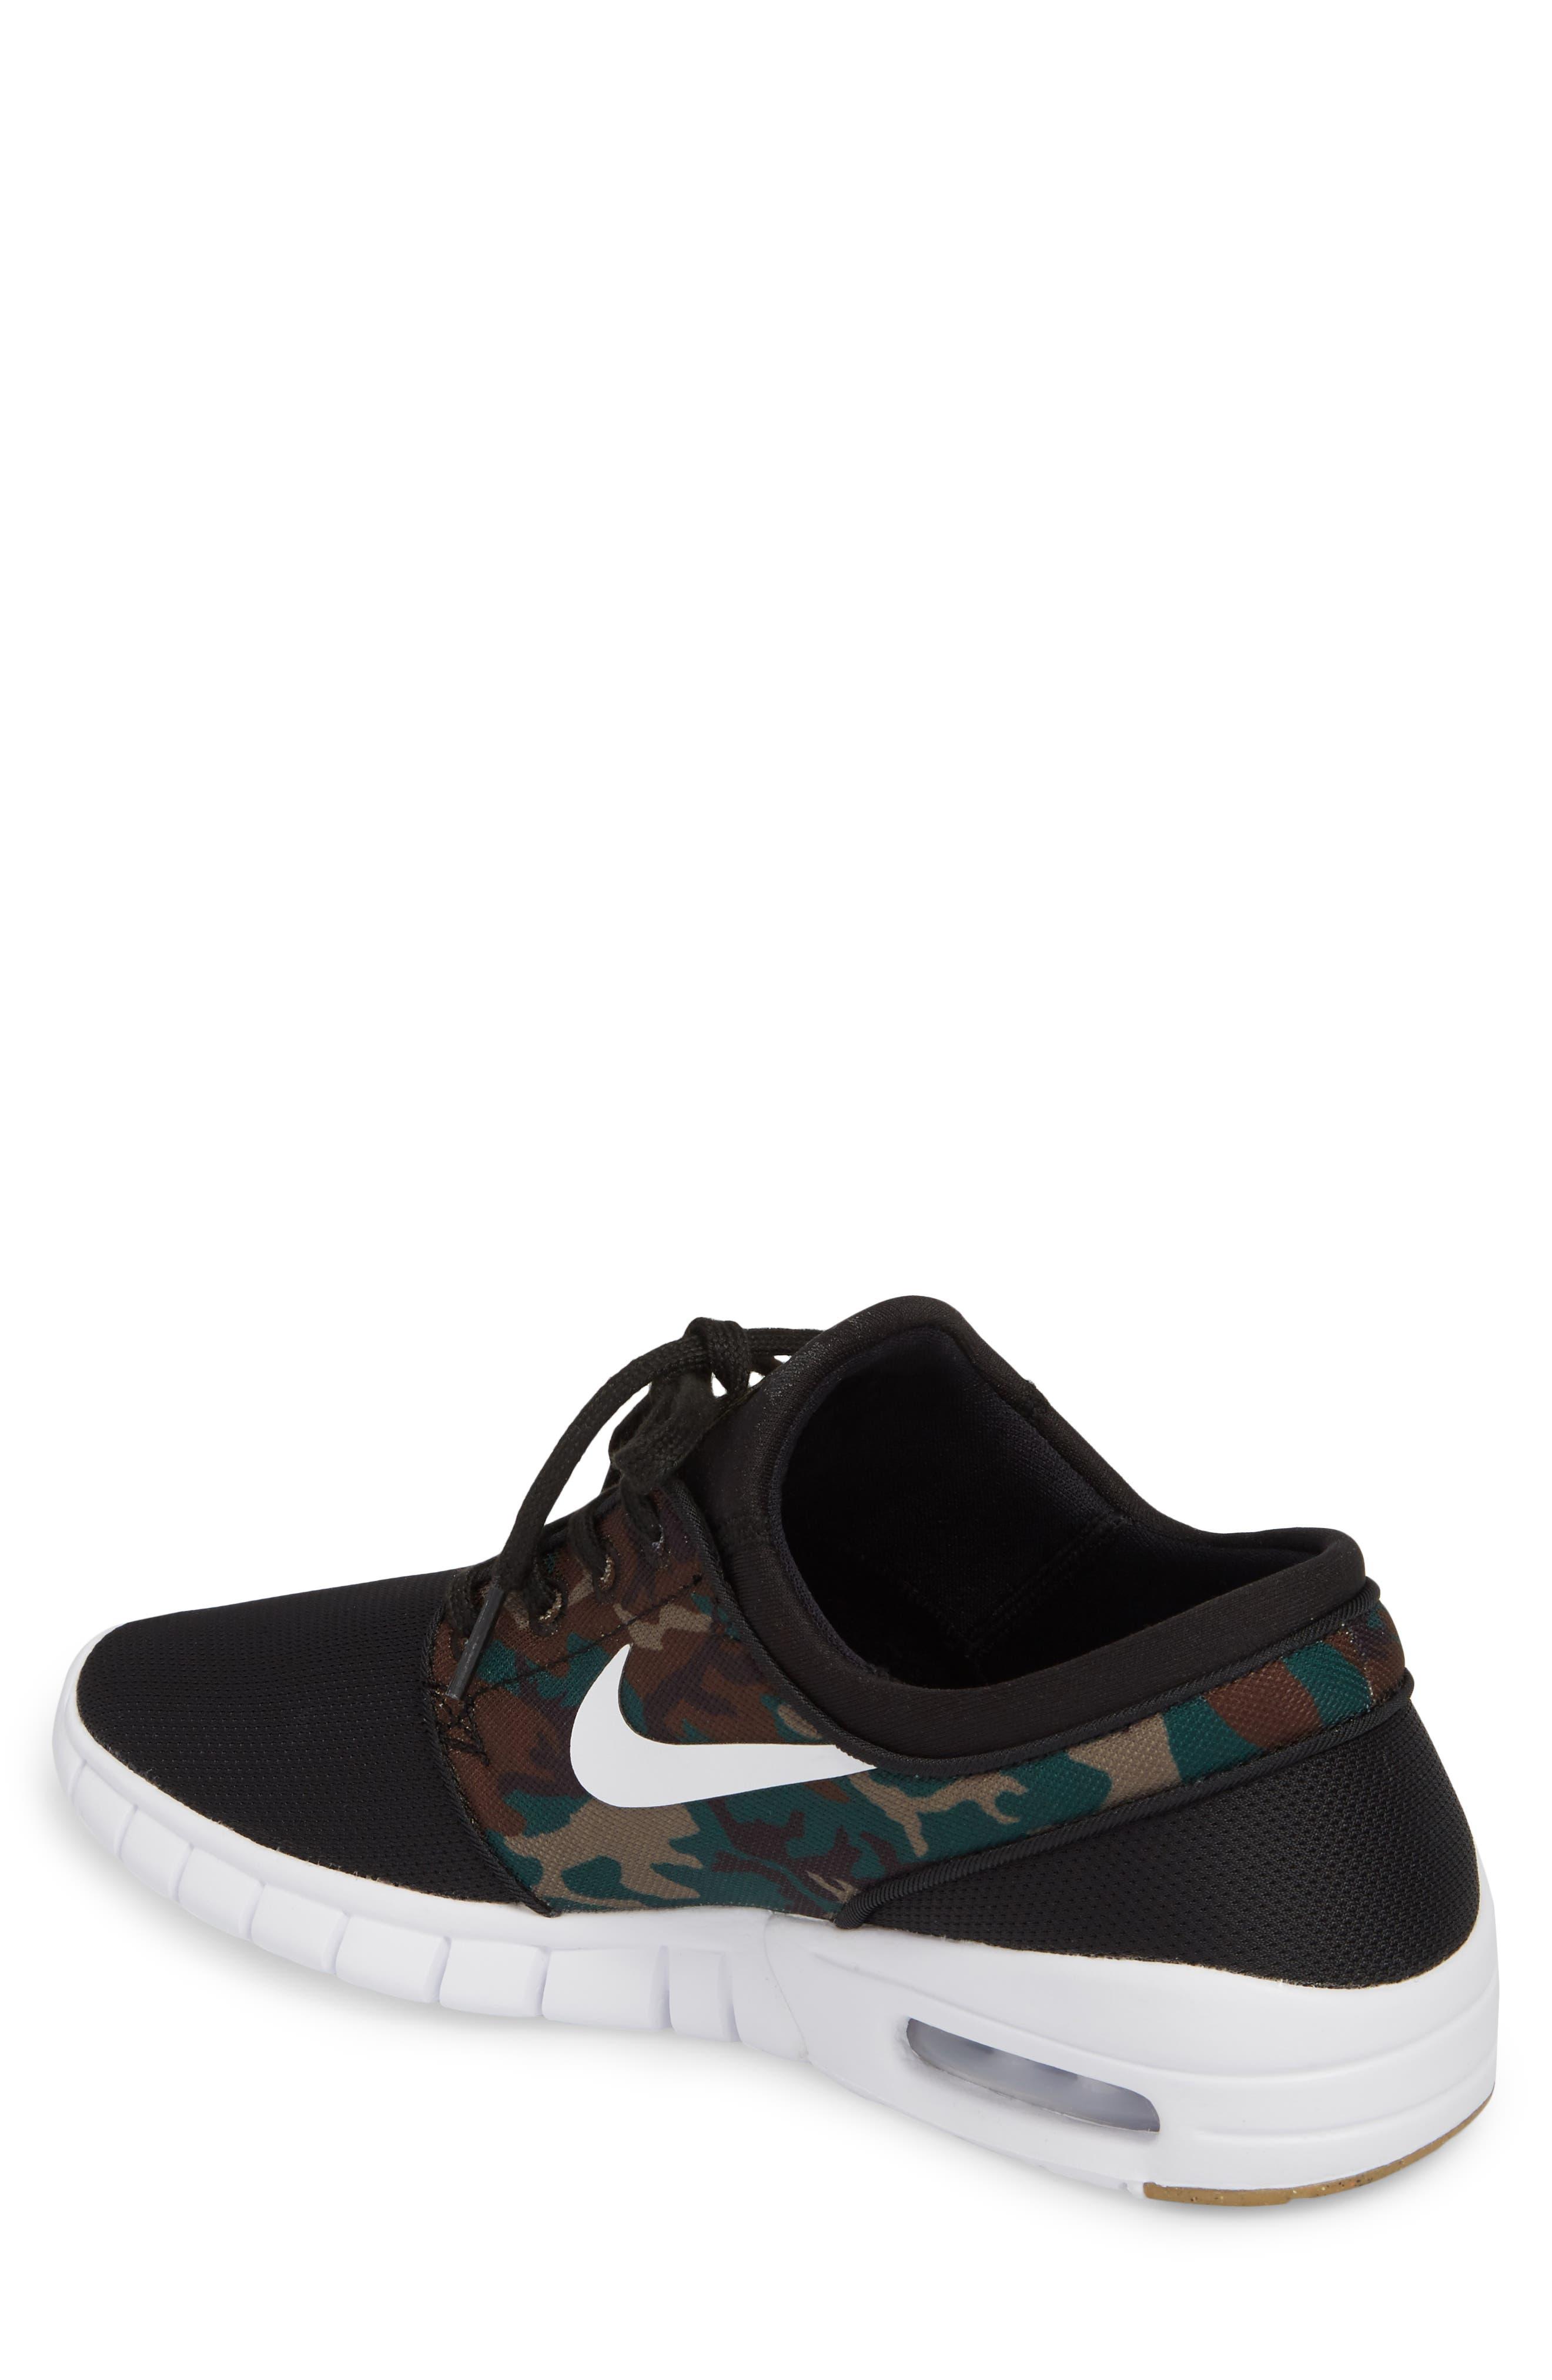 Alternate Image 2  - Nike 'Stefan Janoski - Max SB' Skate Shoe (Men)